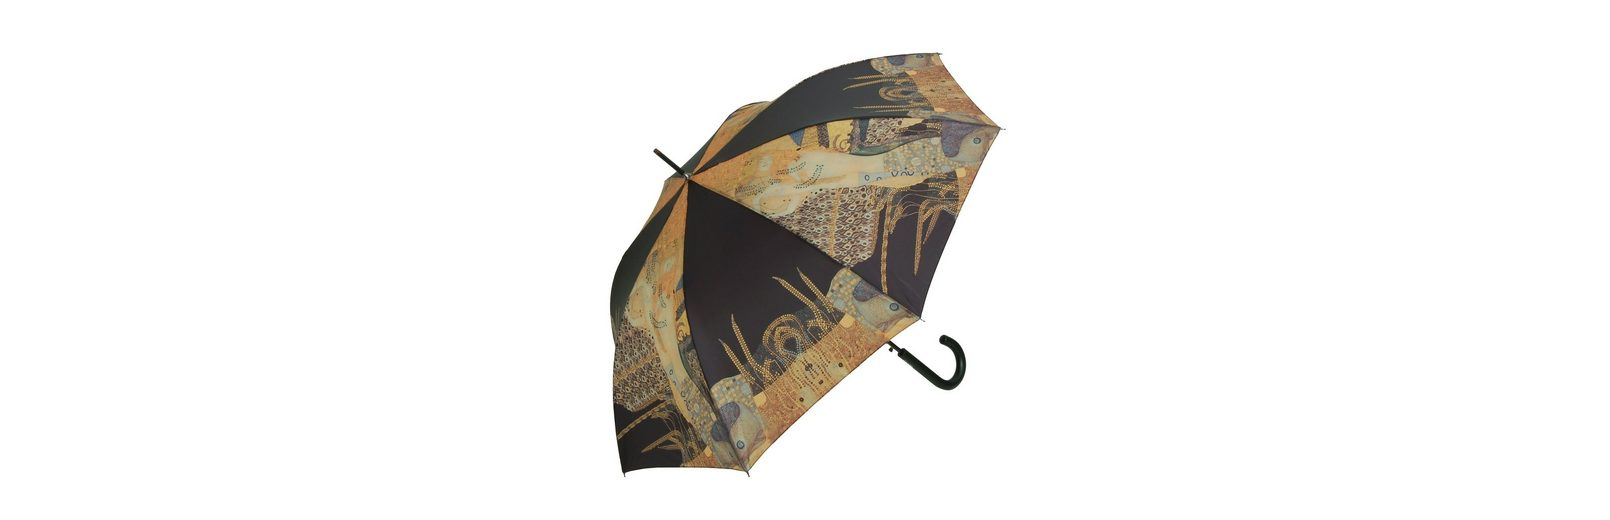 Doppler Regenschirm, »Langschirm Wasserschlangen«